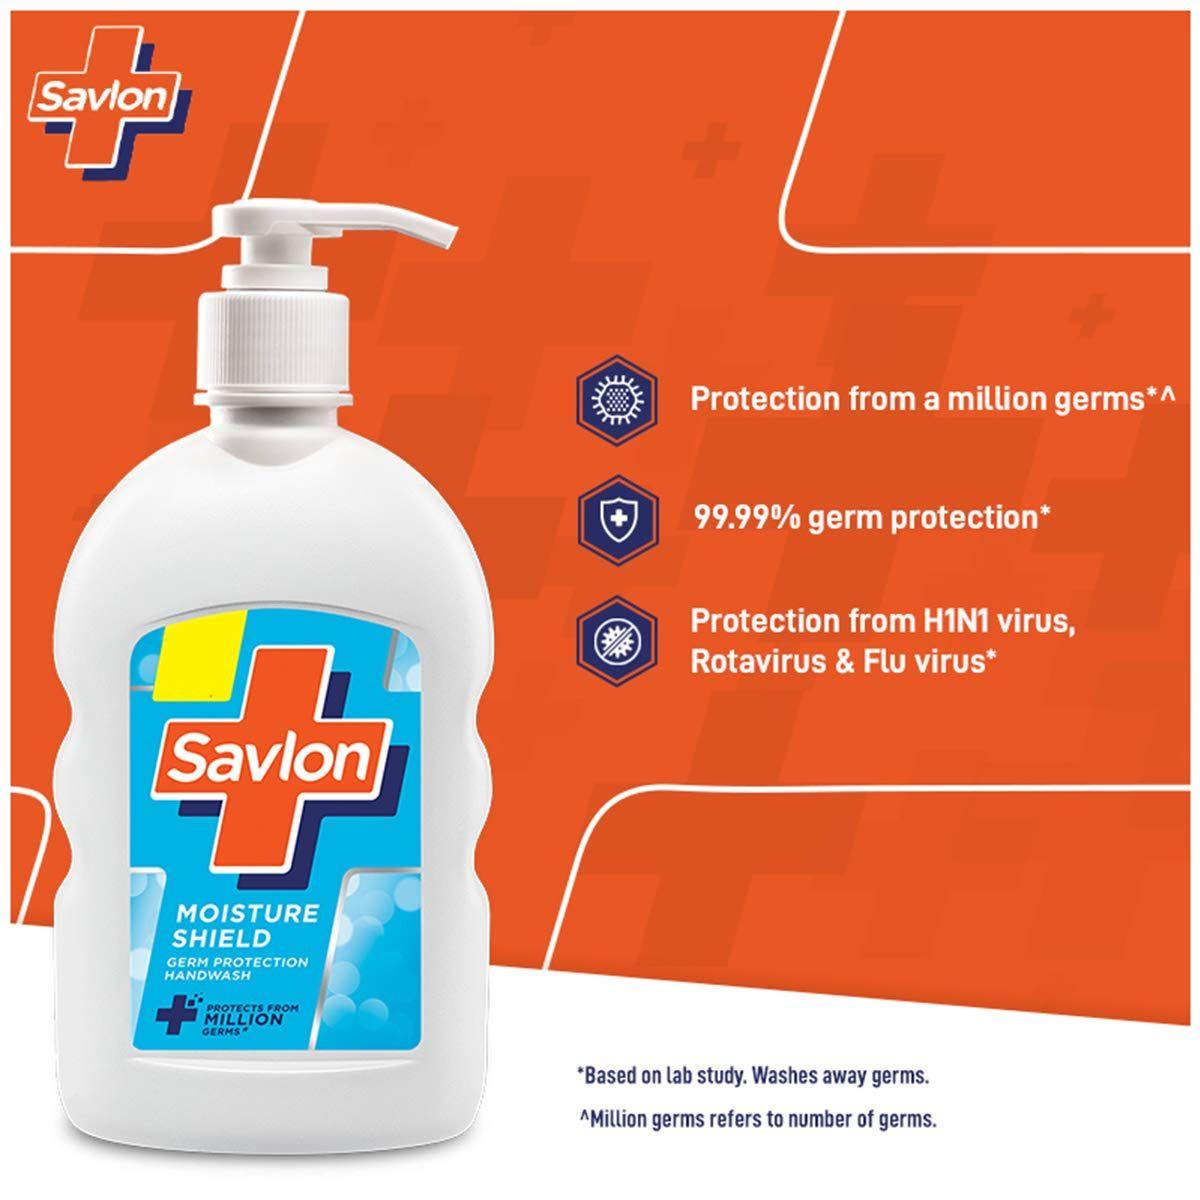 Savlon Moisture Shield Germ Protection Handwash, 200 ml, Pack of 1